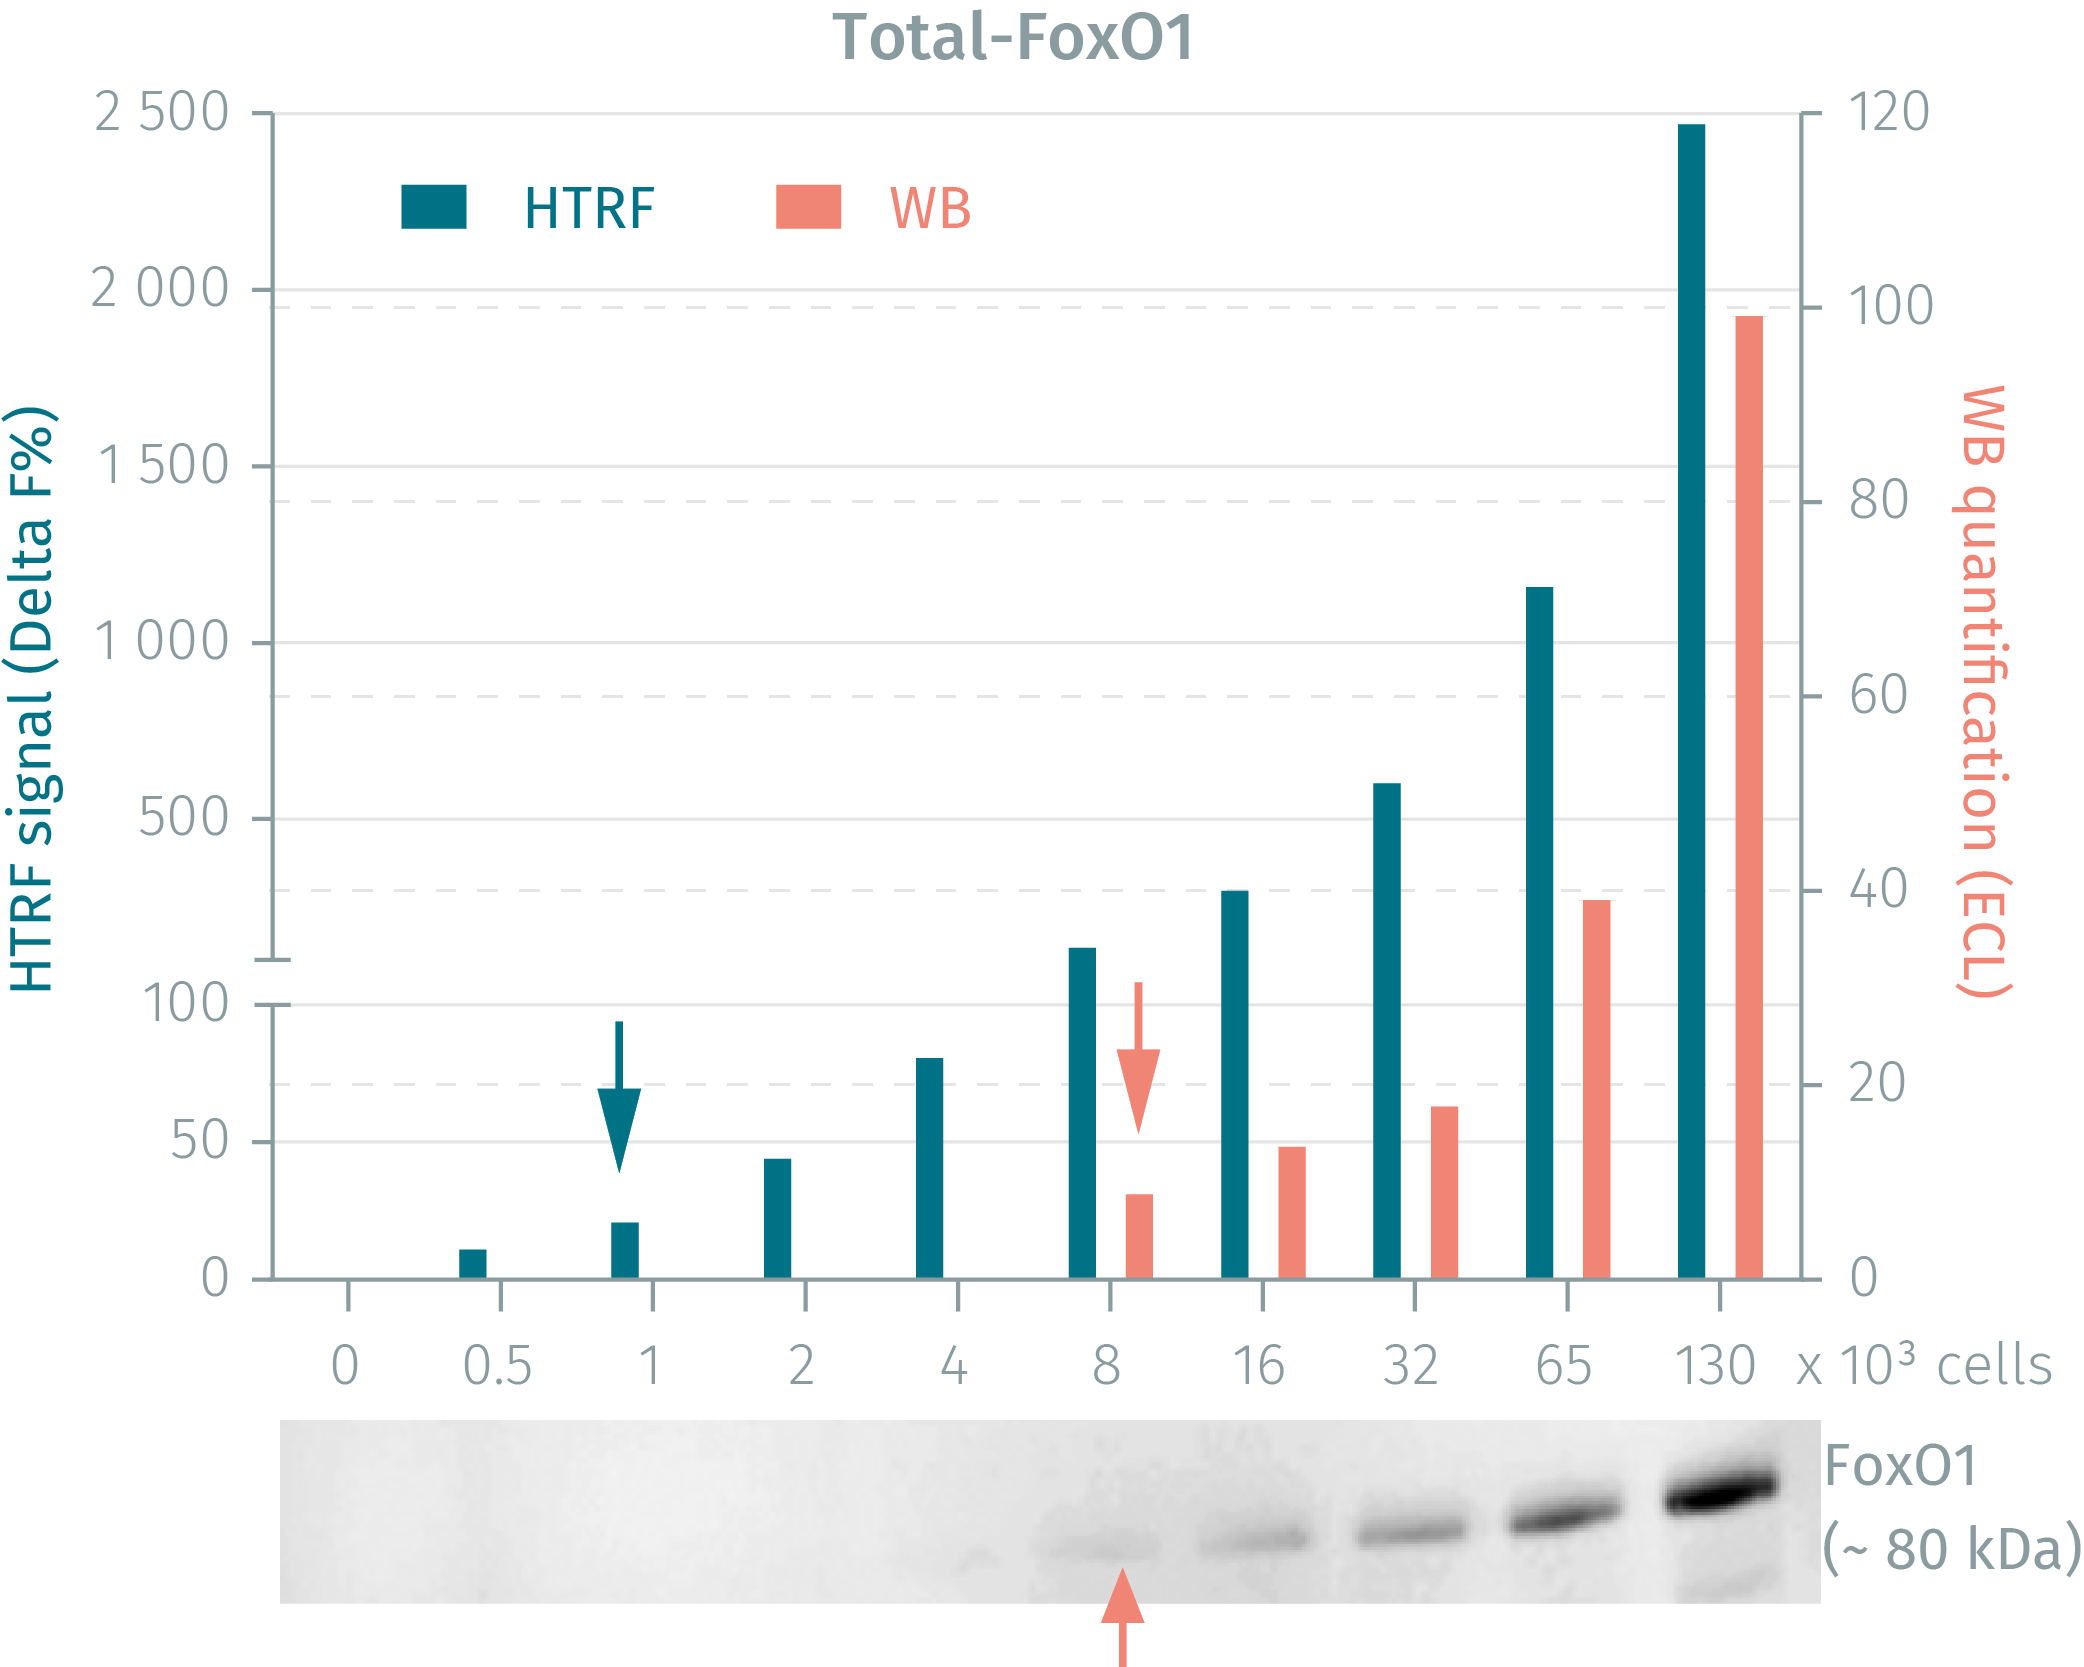 HTRF Total FoxO1 assay vs WB on human HEK293 cells